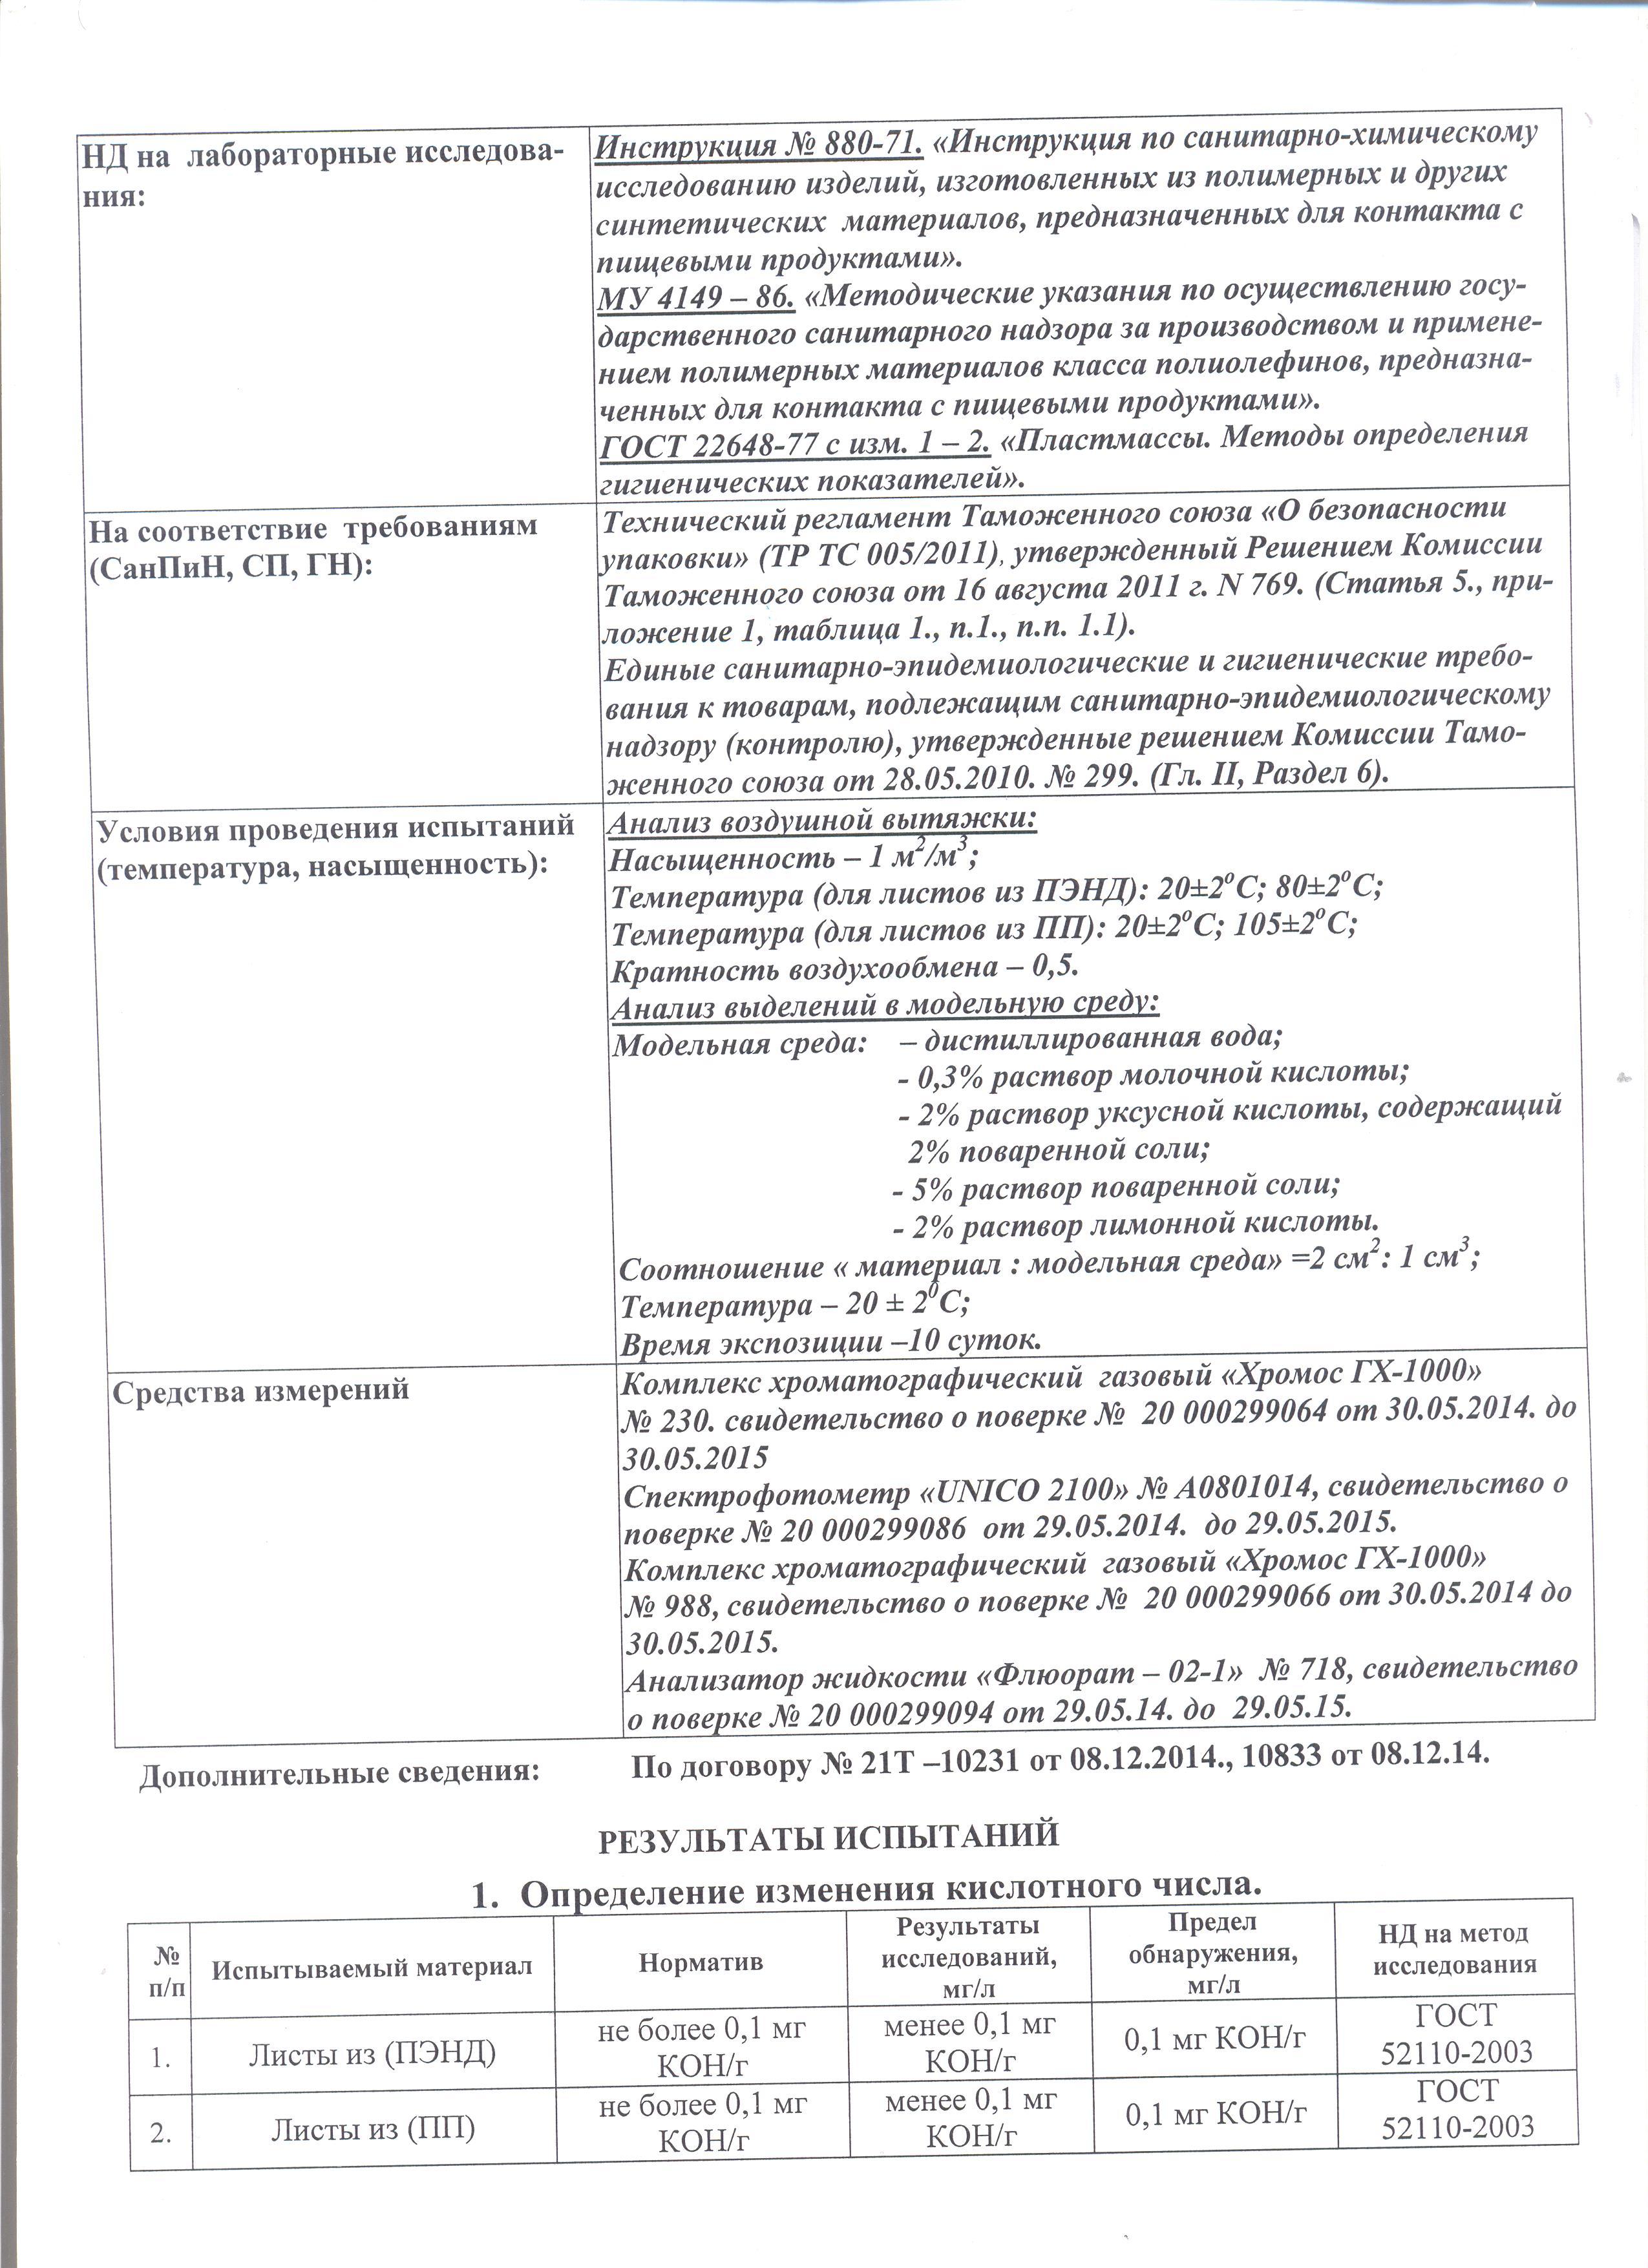 Protokol-ispytanij-1-list-ob-storona